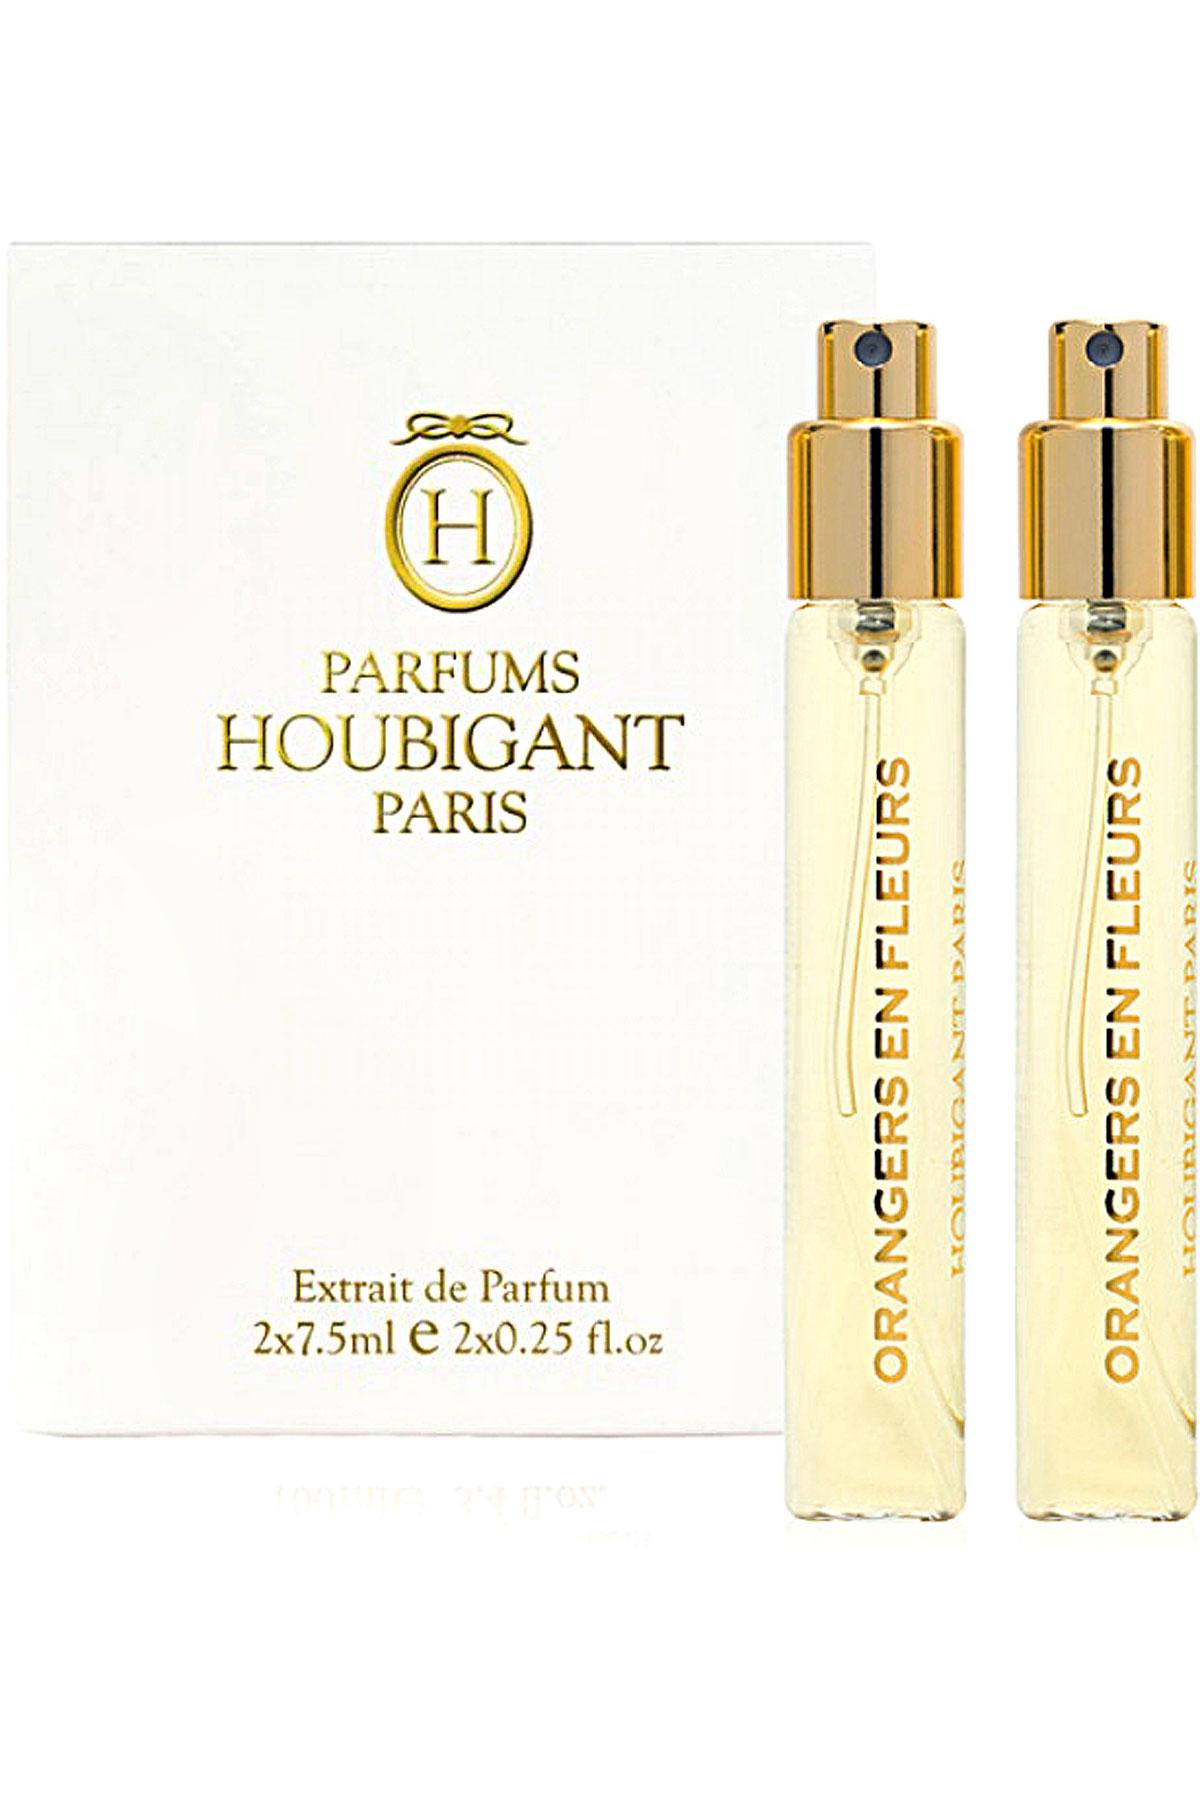 Houbigant Paris Fragrances for Women, Orangers En Fleurs - Travel Refill - 2 X 7.5 Ml, 2019, 2 x 7.5 ml